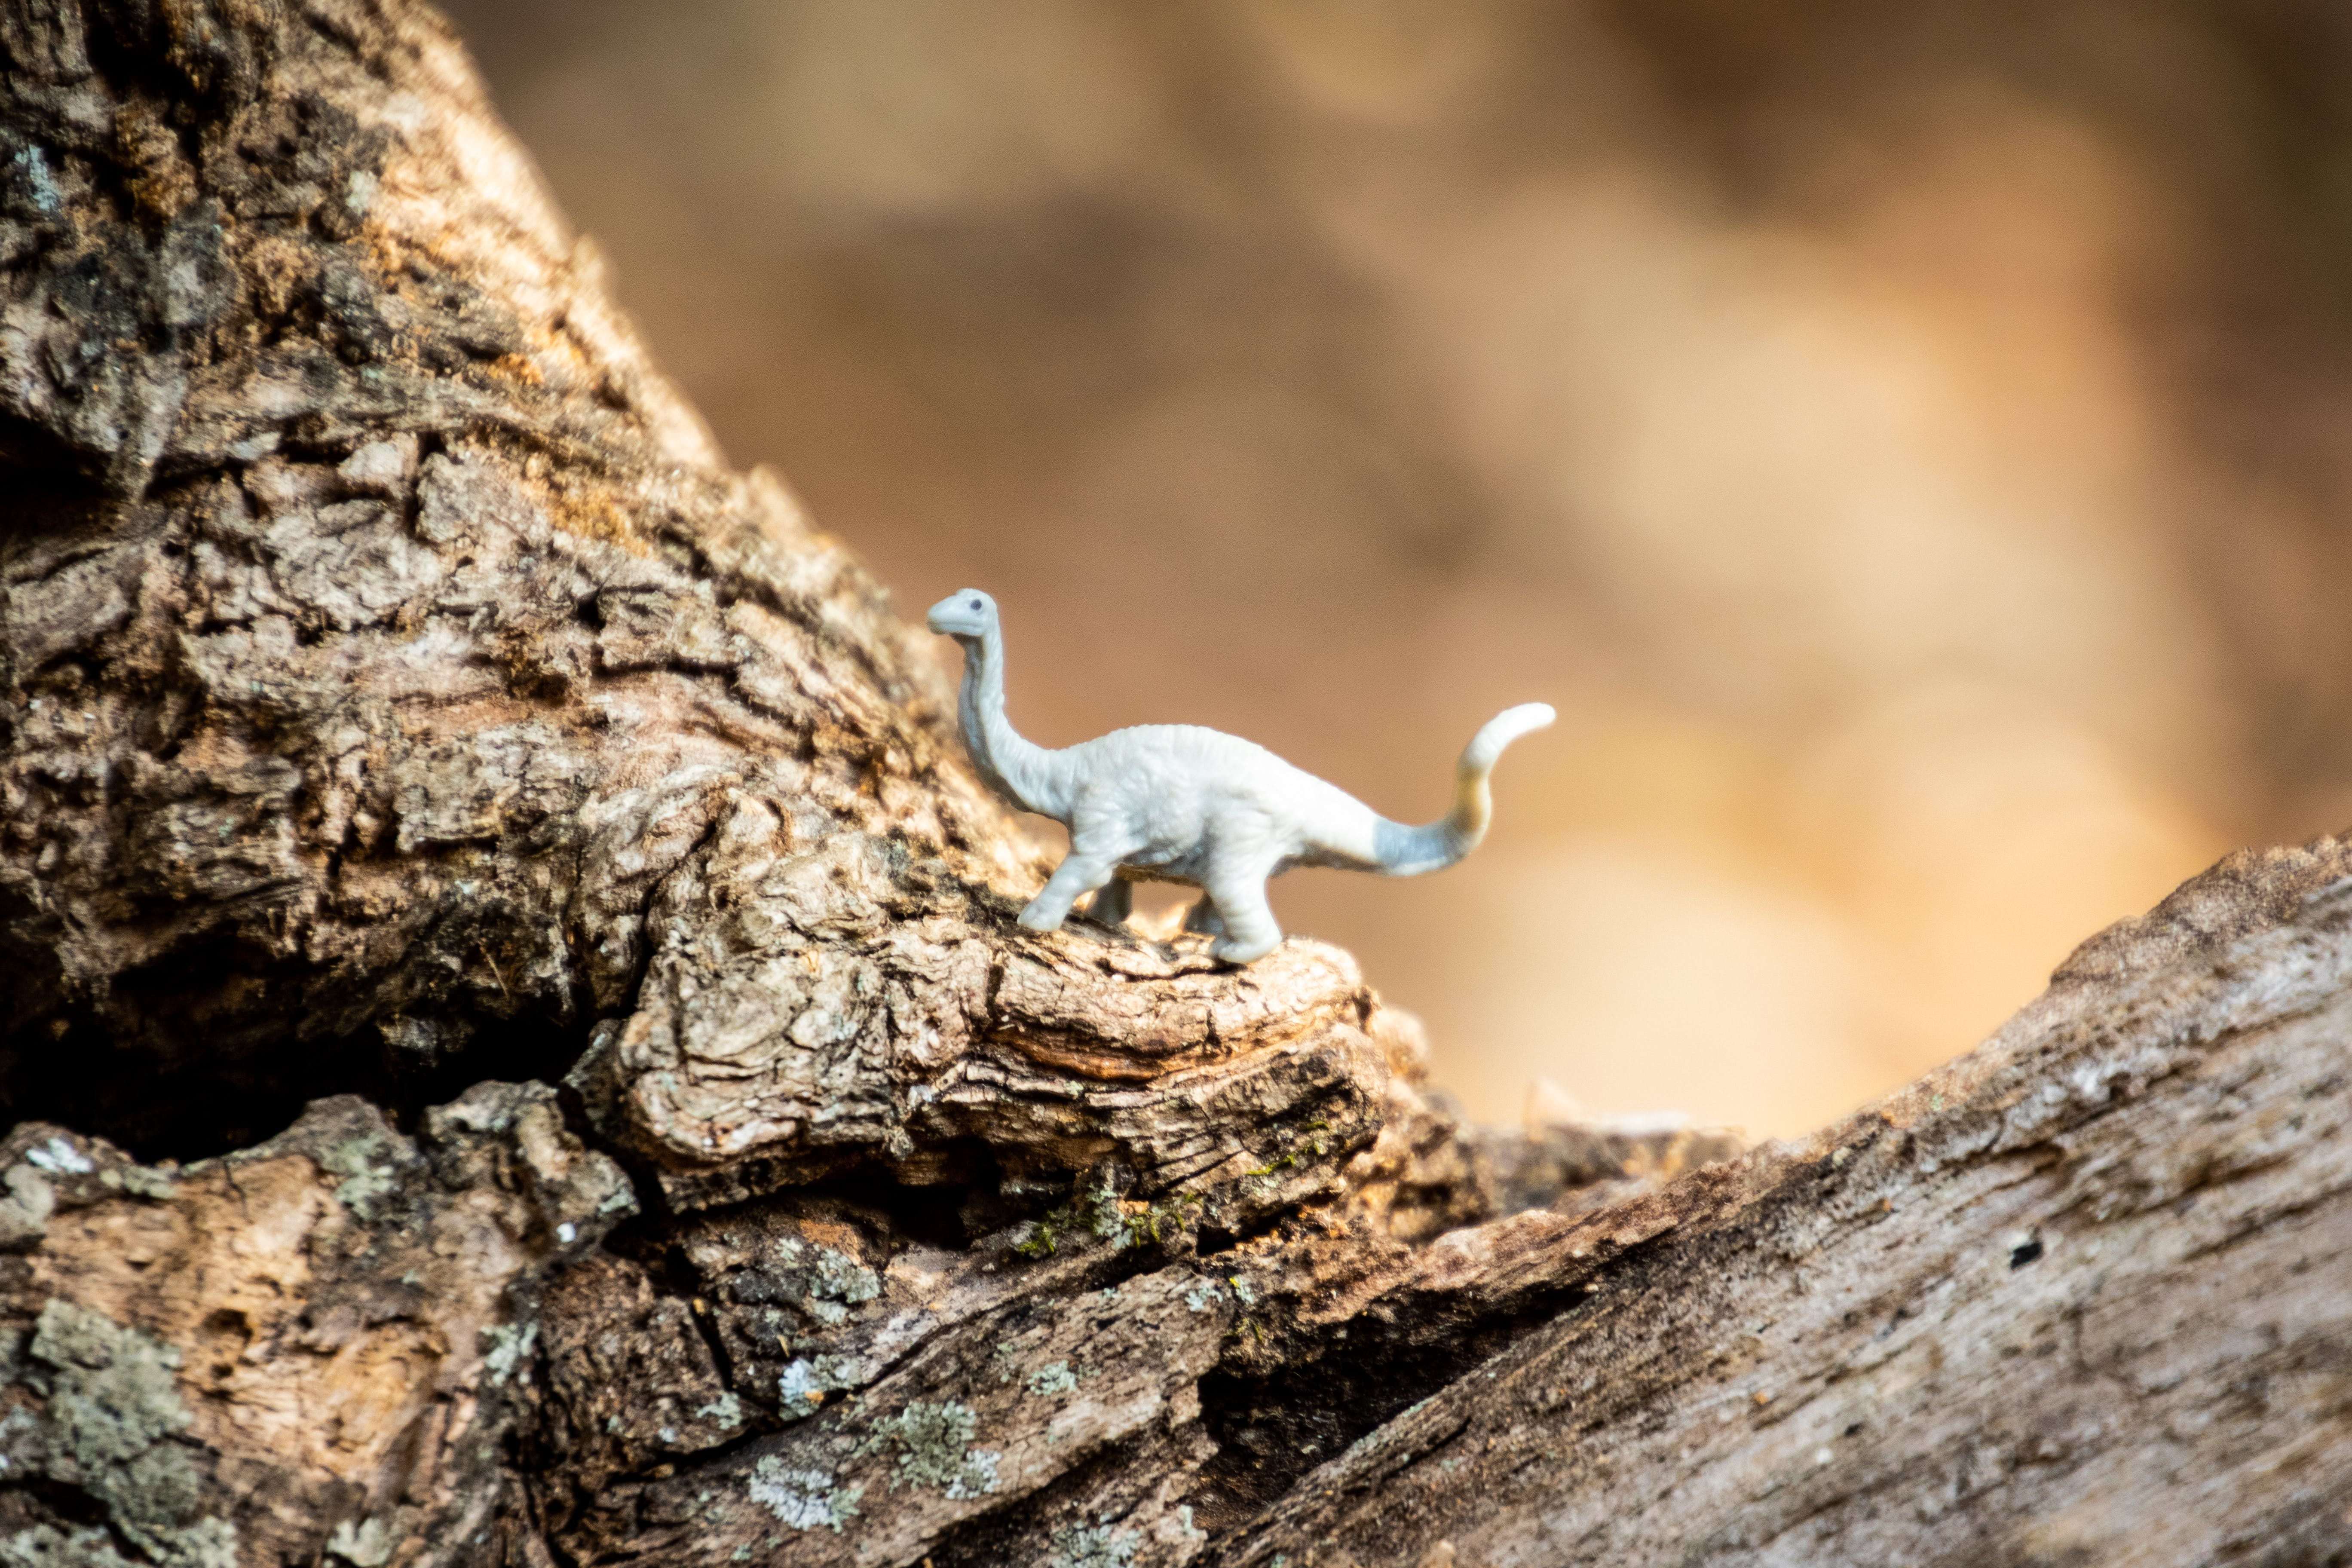 Gray Dinosaur Toy on Rock